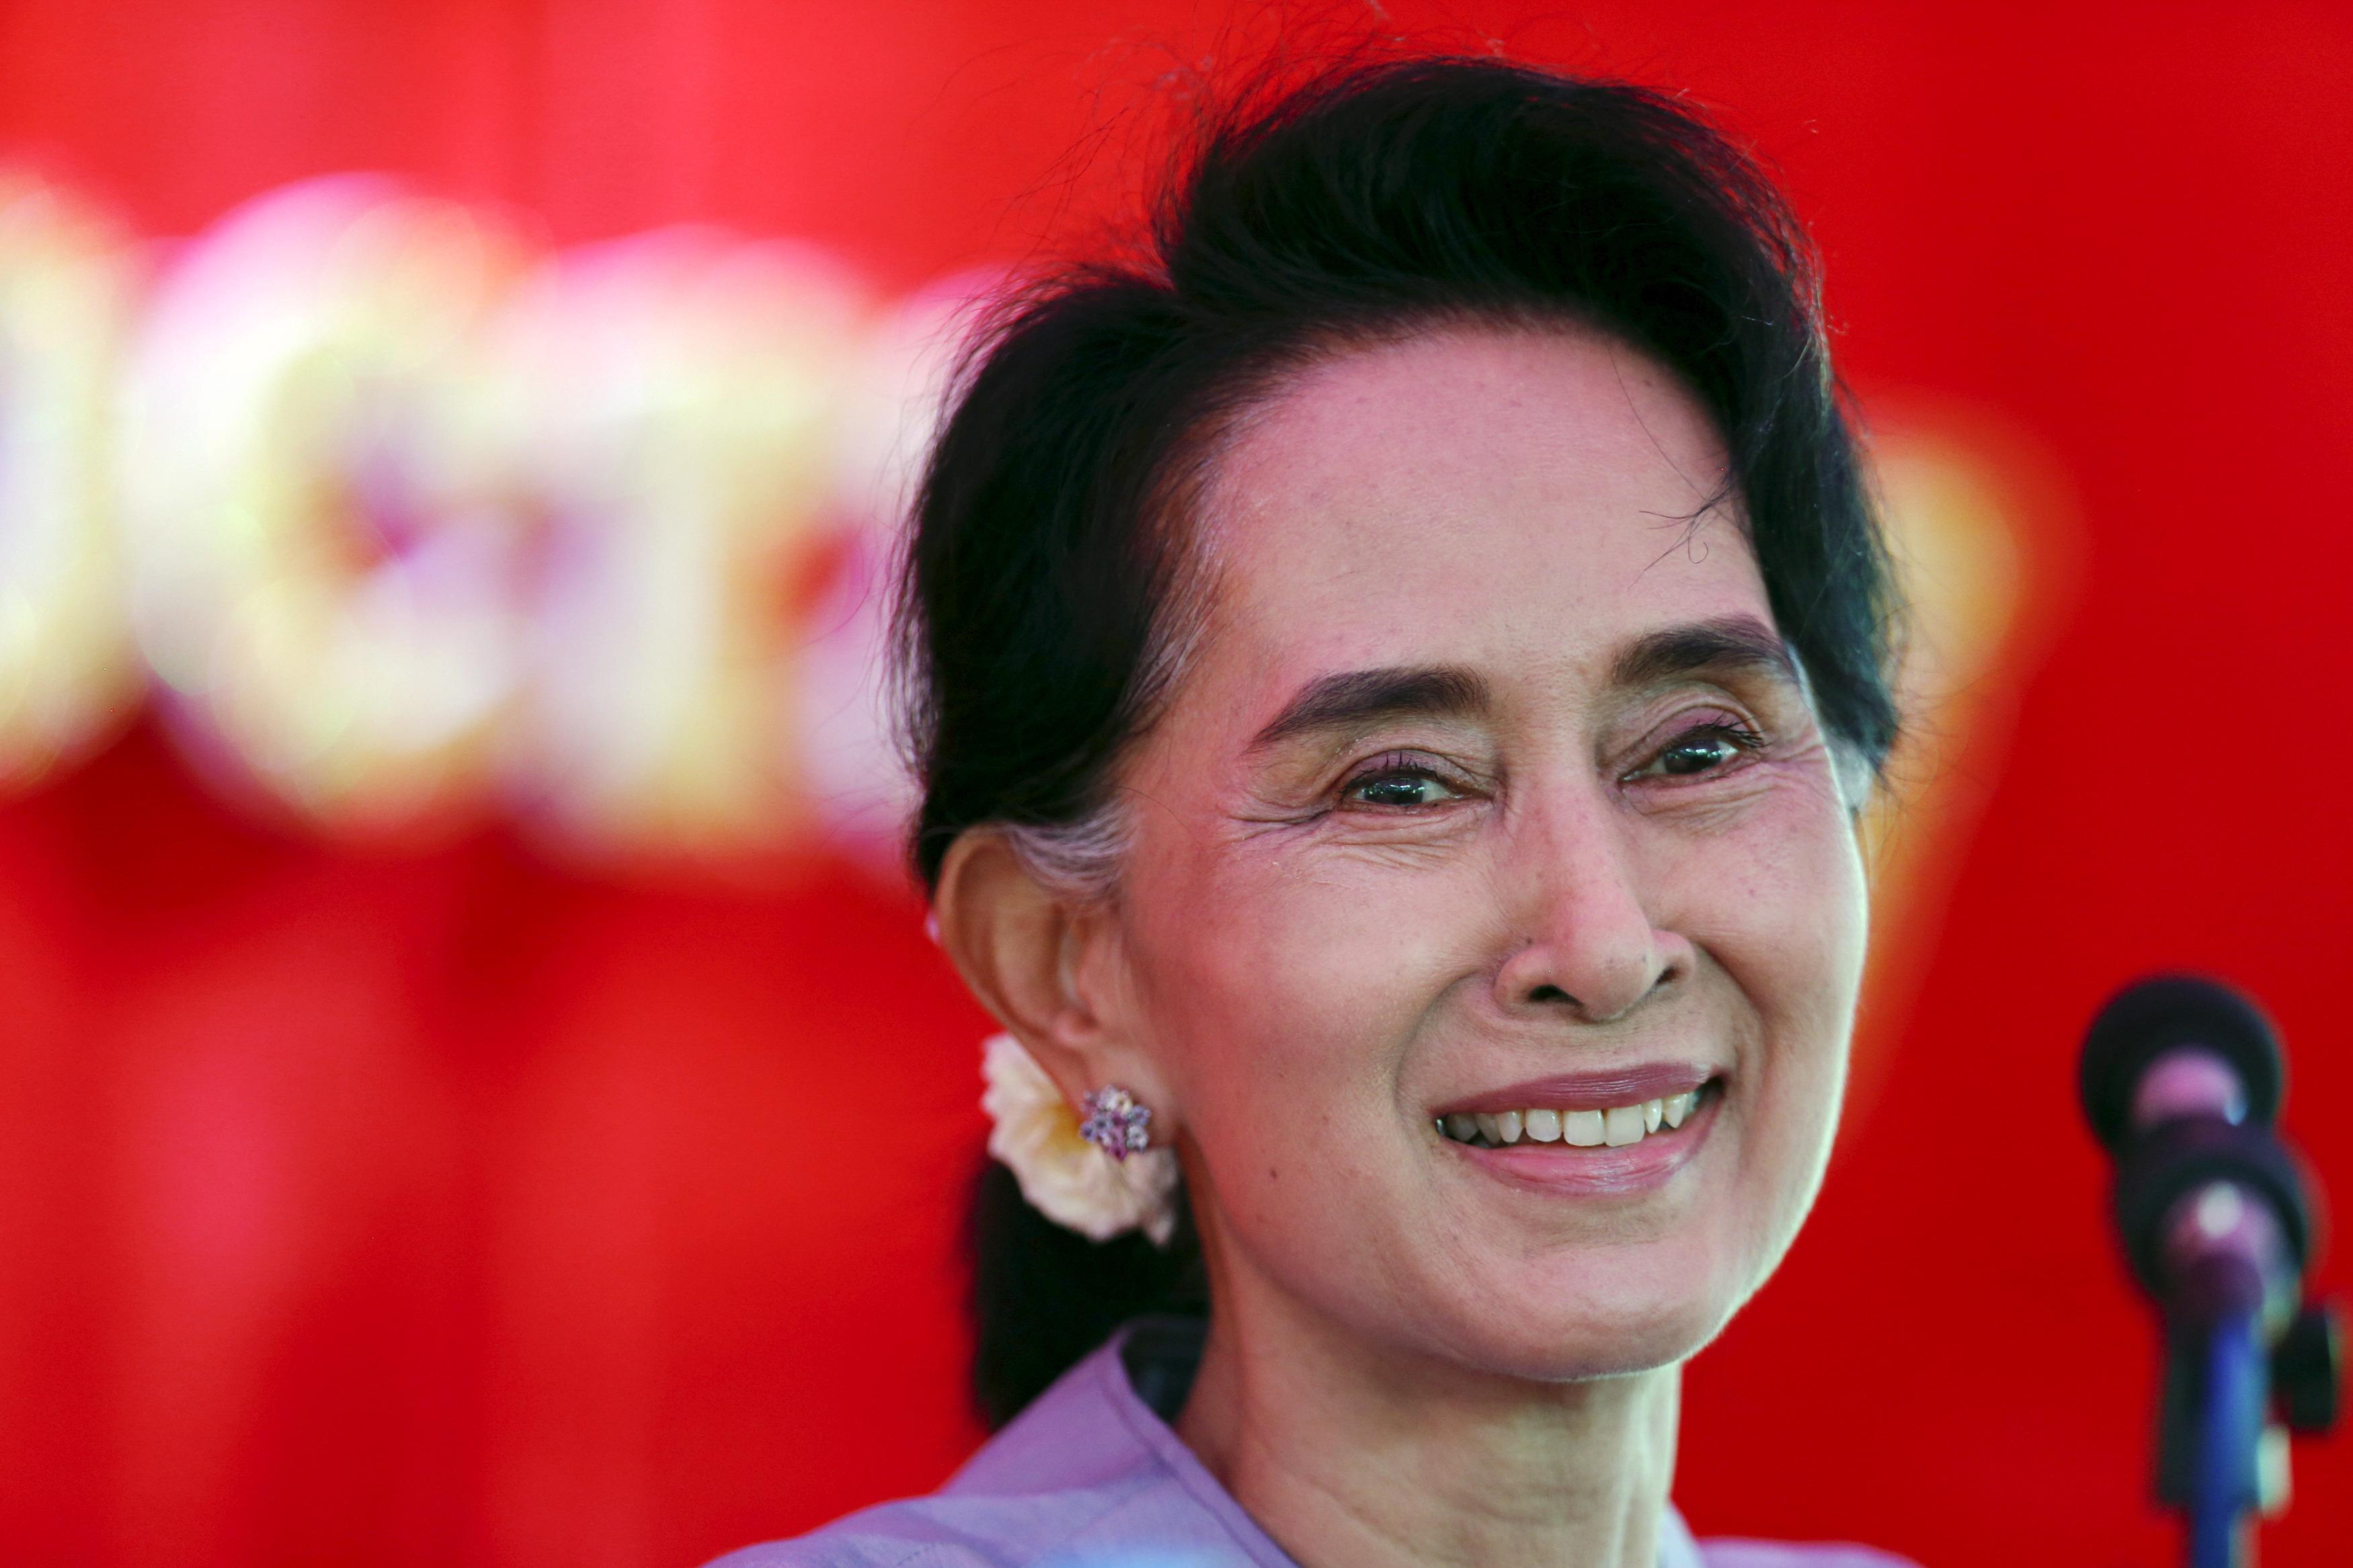 Burma: Aung San Suu Kyi 'Above President' if NLD Wins Polls   Time